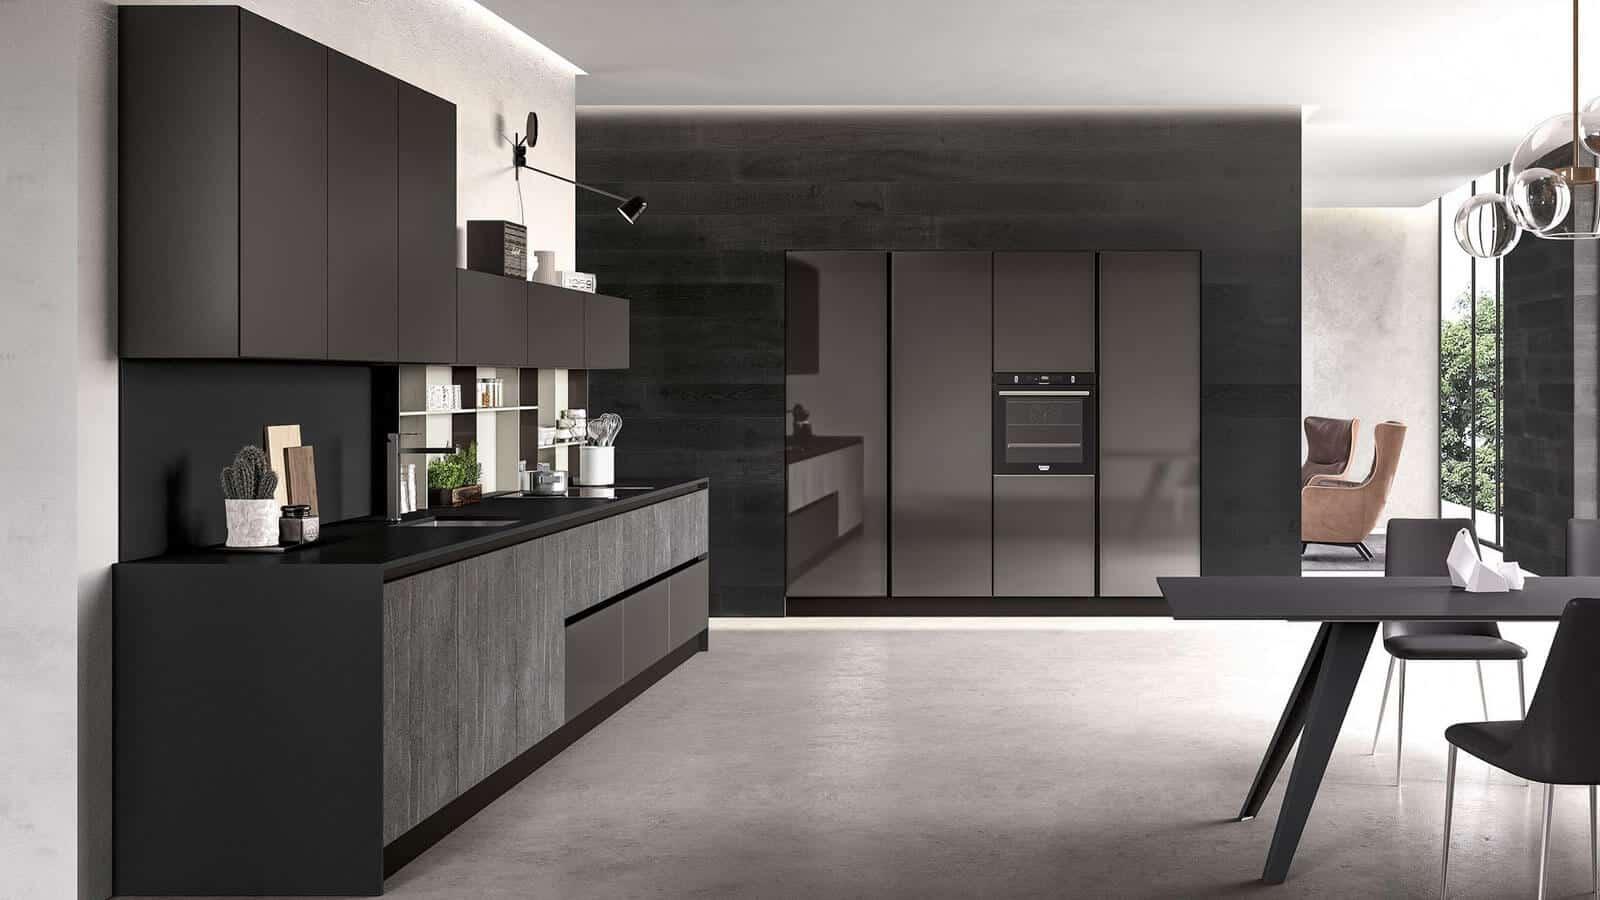 Cuisine Noire Fabrication Italienne Optimal Annecy